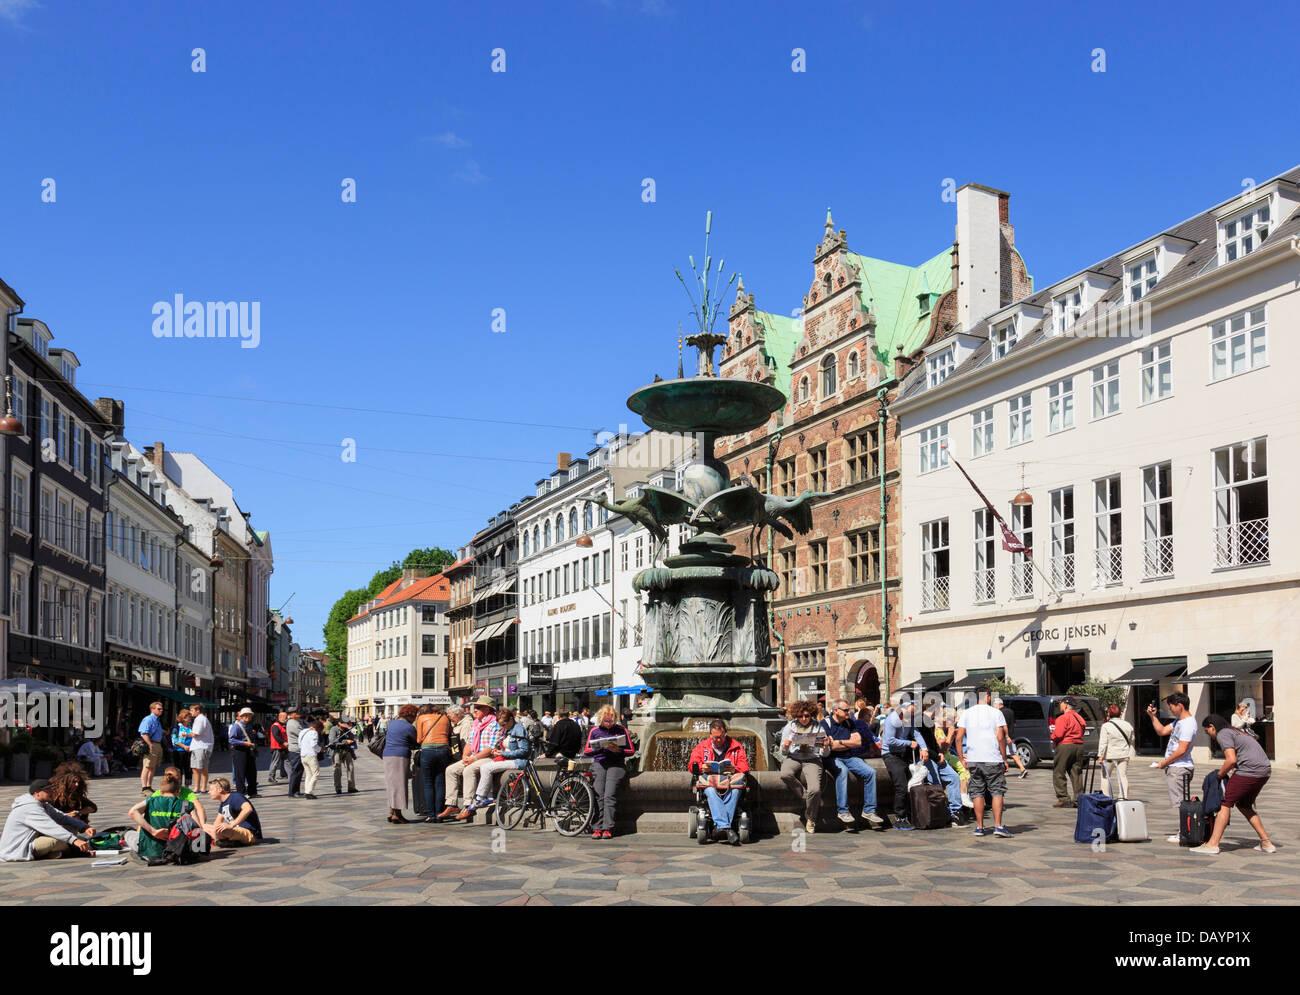 Old Amagertorv Square and Stork Fountain (Storkespringvandet) busy with people. Amager Torv Strøget Copenhagen - Stock Image